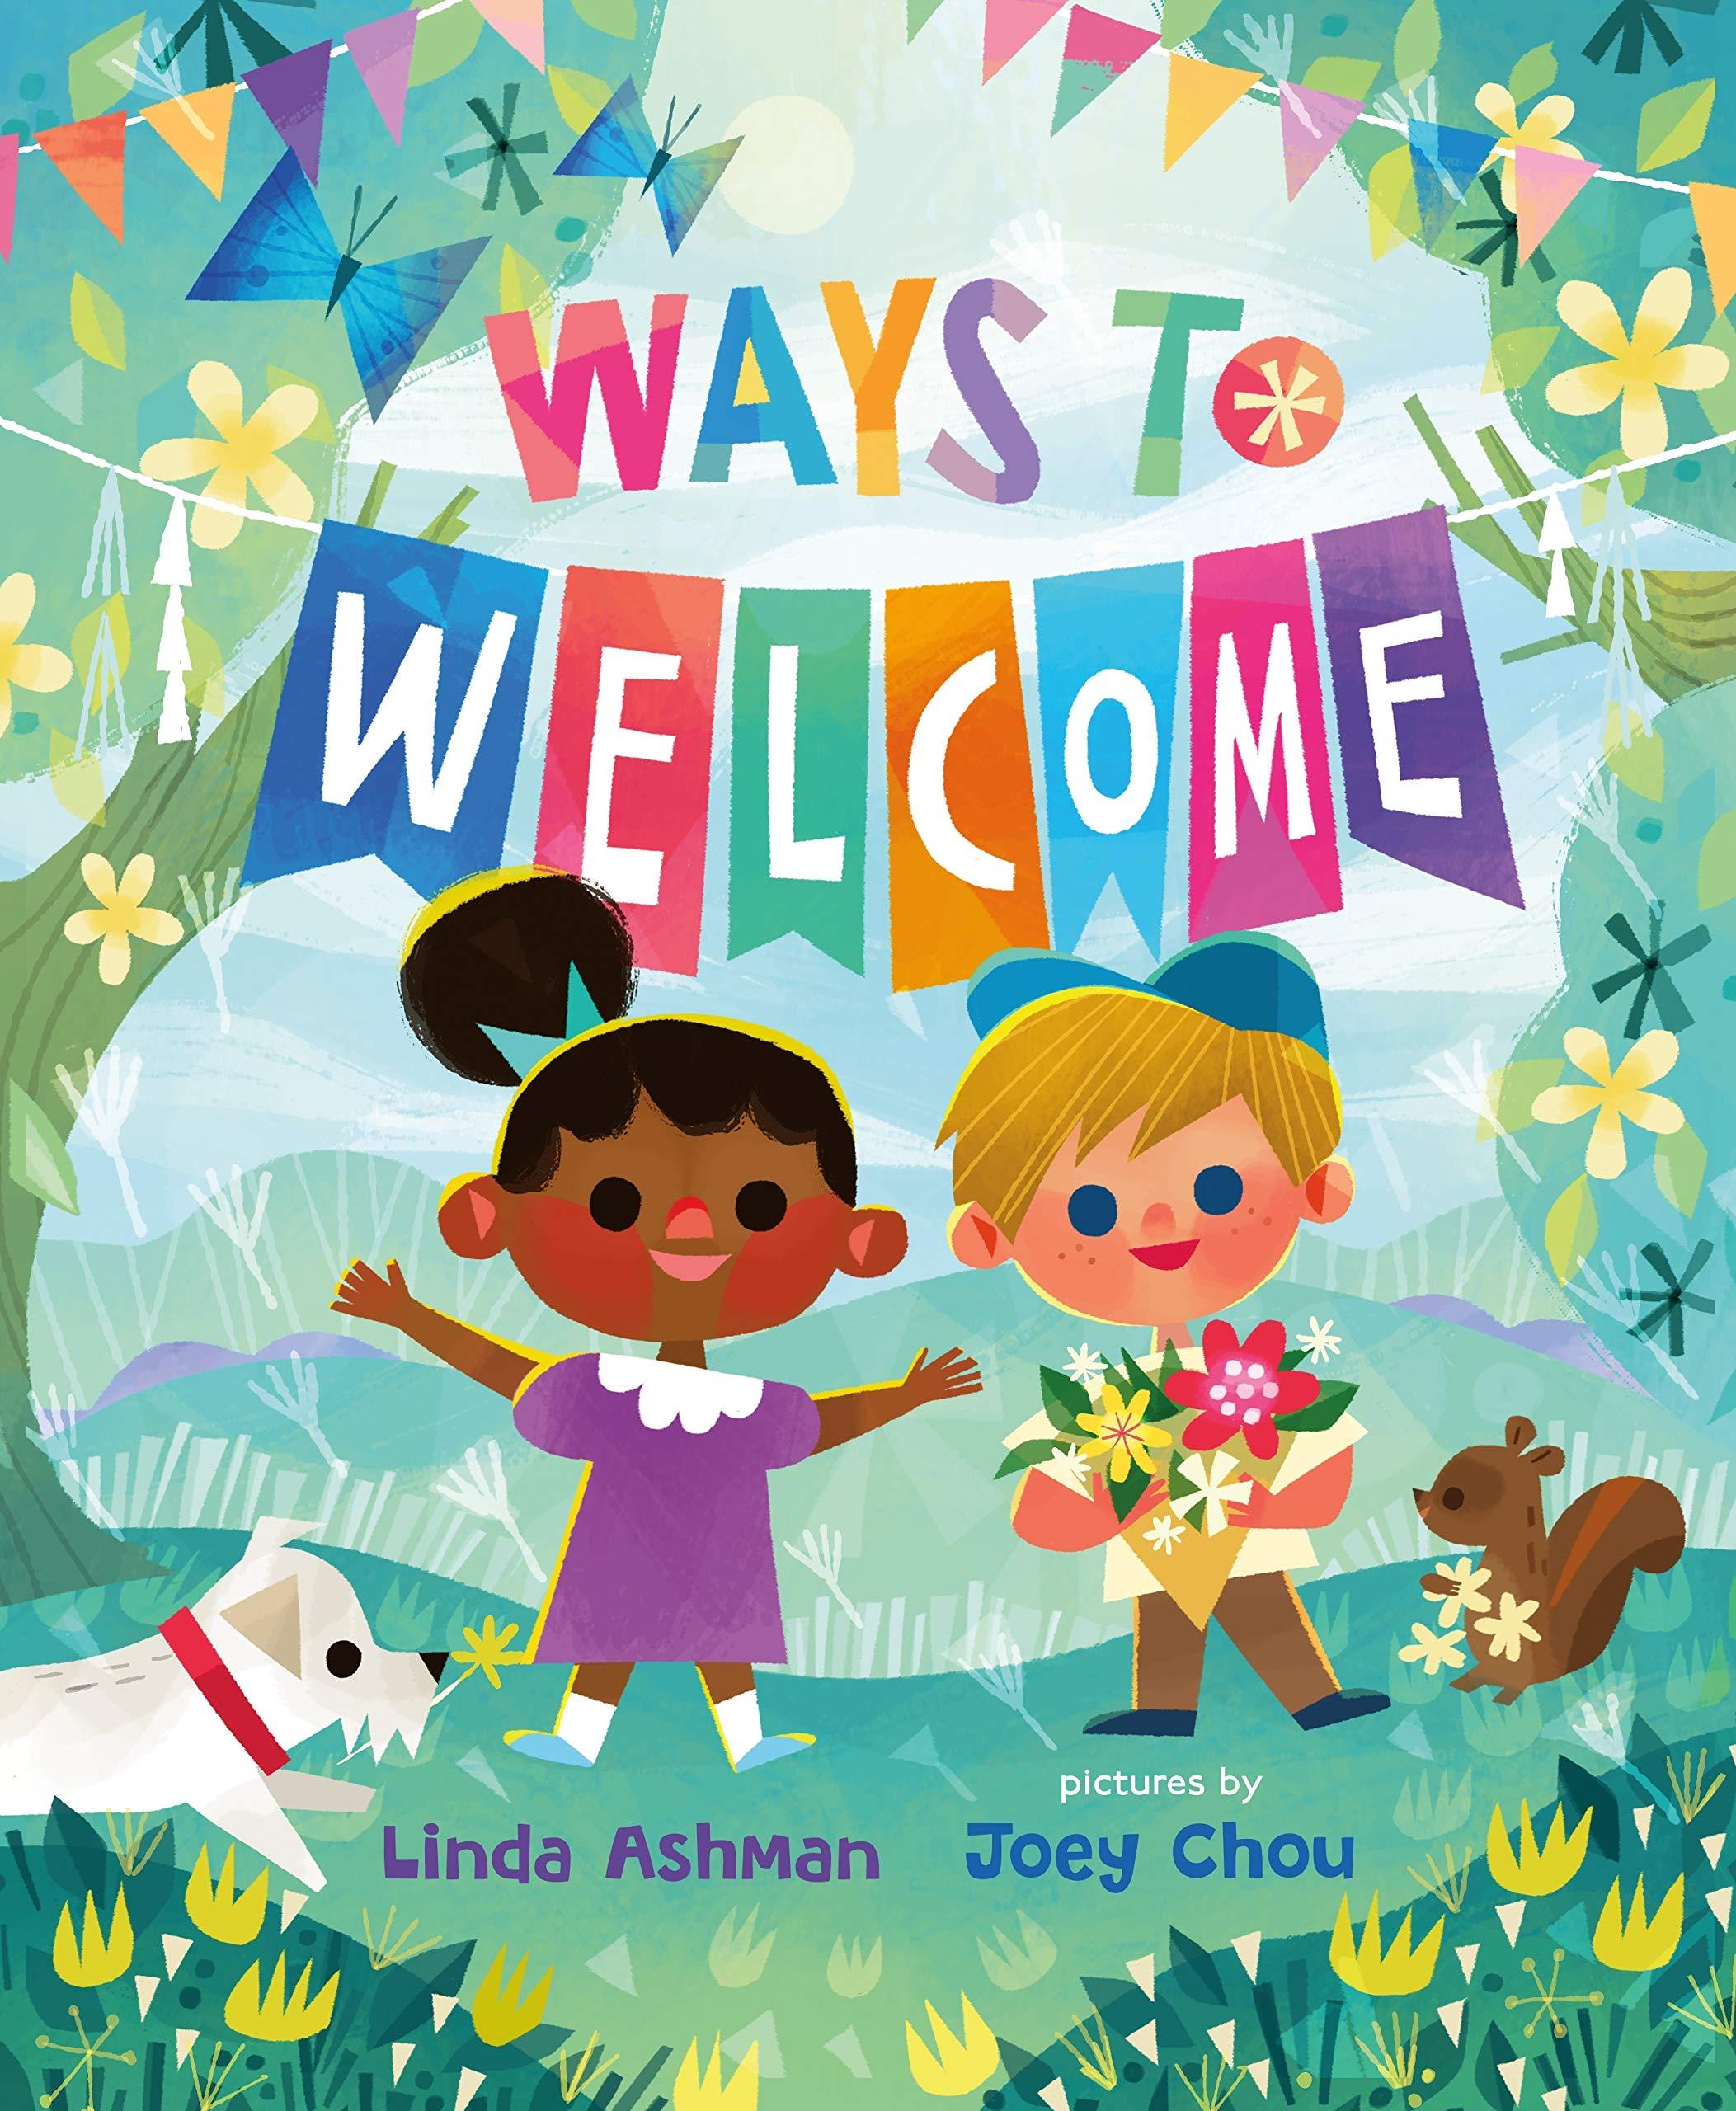 Ways to Welcome: Ashman, Linda, Chou, Joey: 9780374313180: Amazon.com: Books